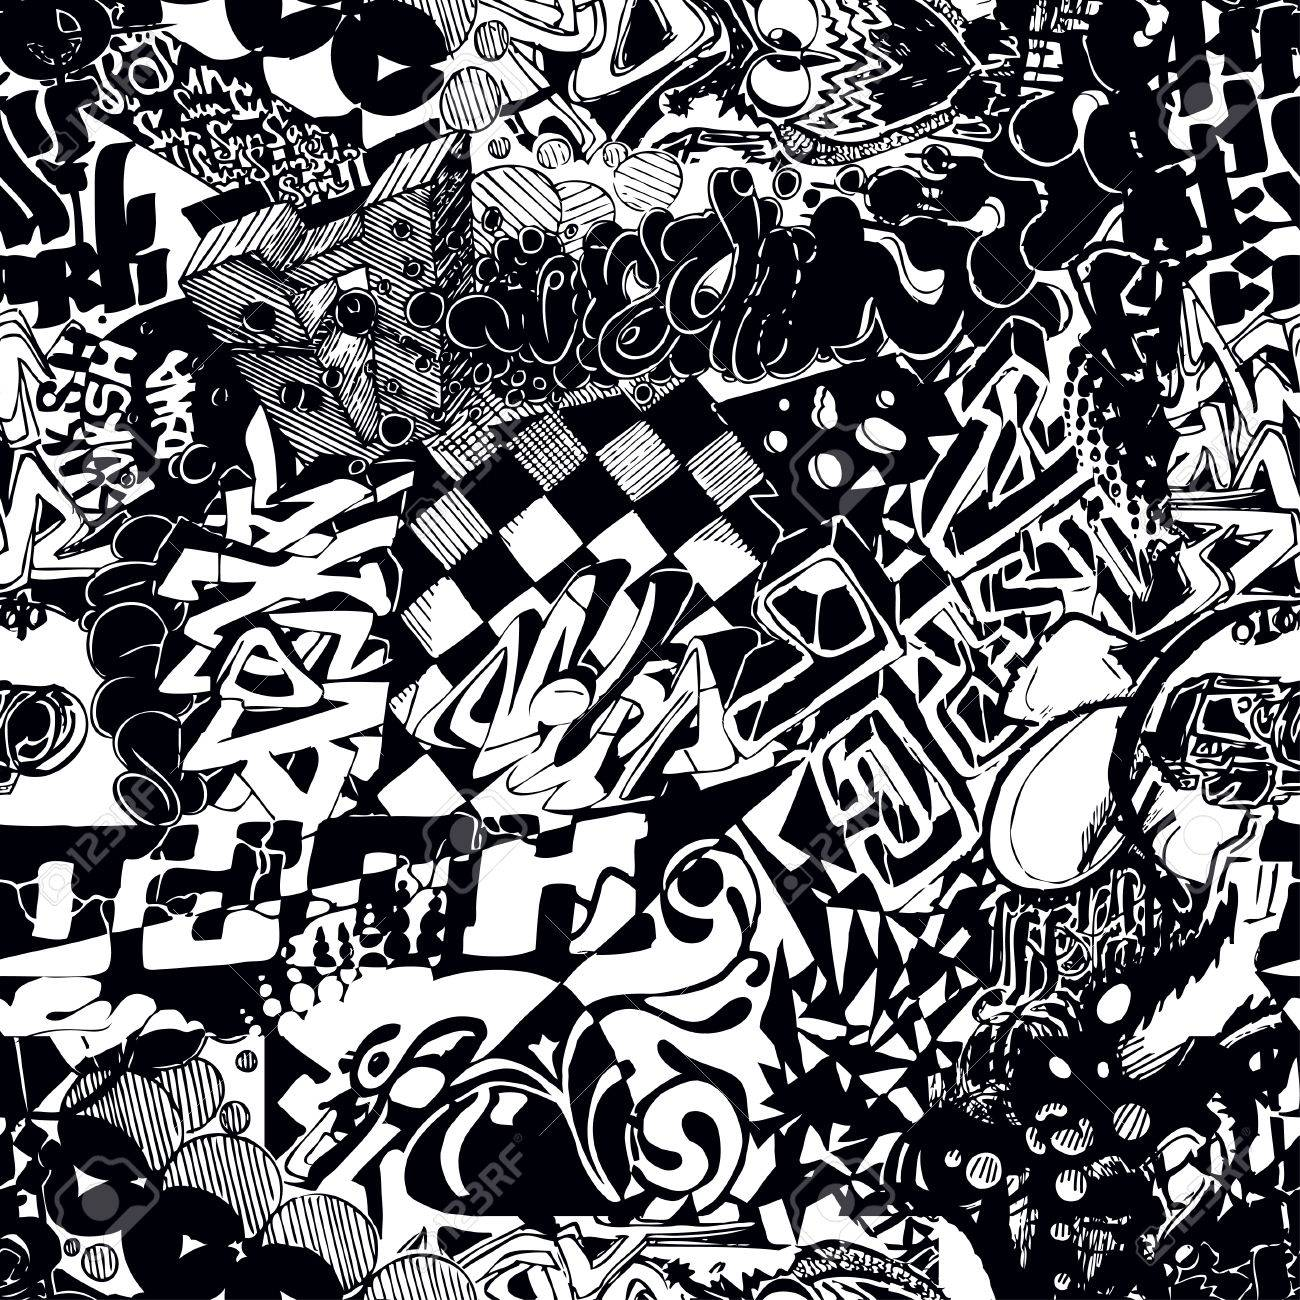 Graffiti A Black And White